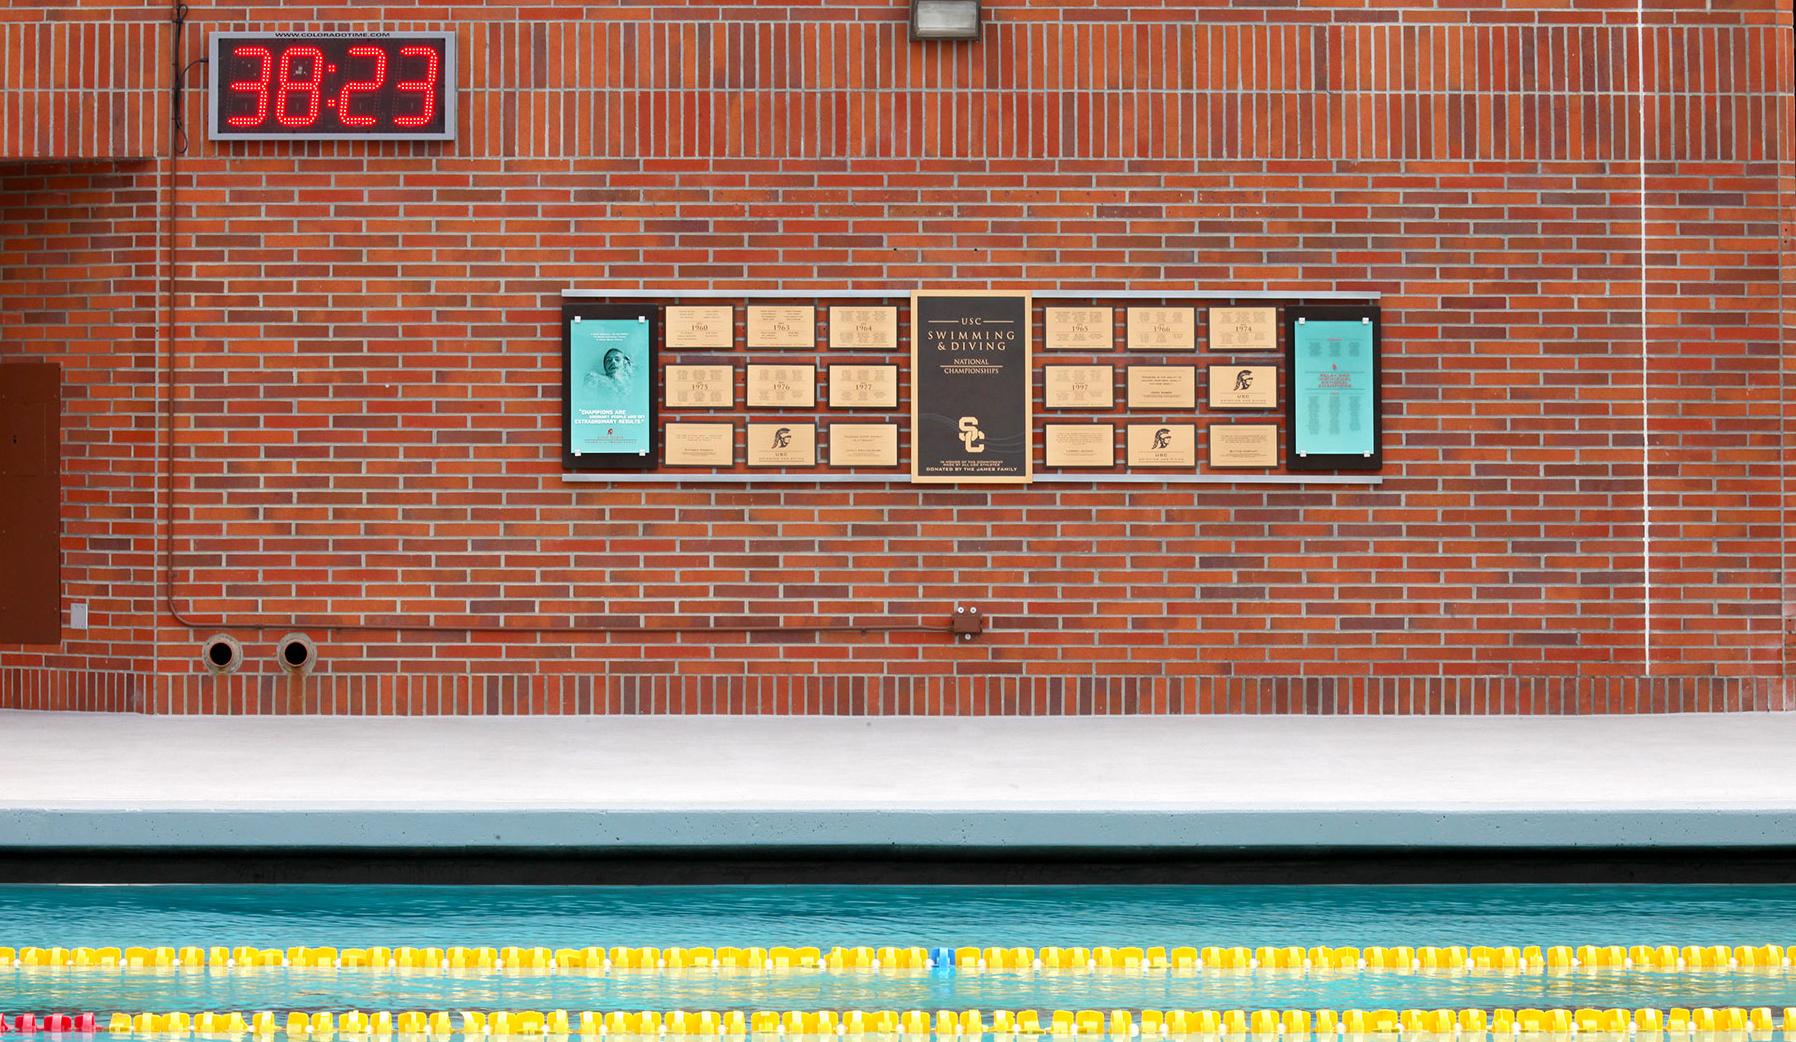 Uytengsu Aquatics Center installation image: Swimming and Diving National Championships